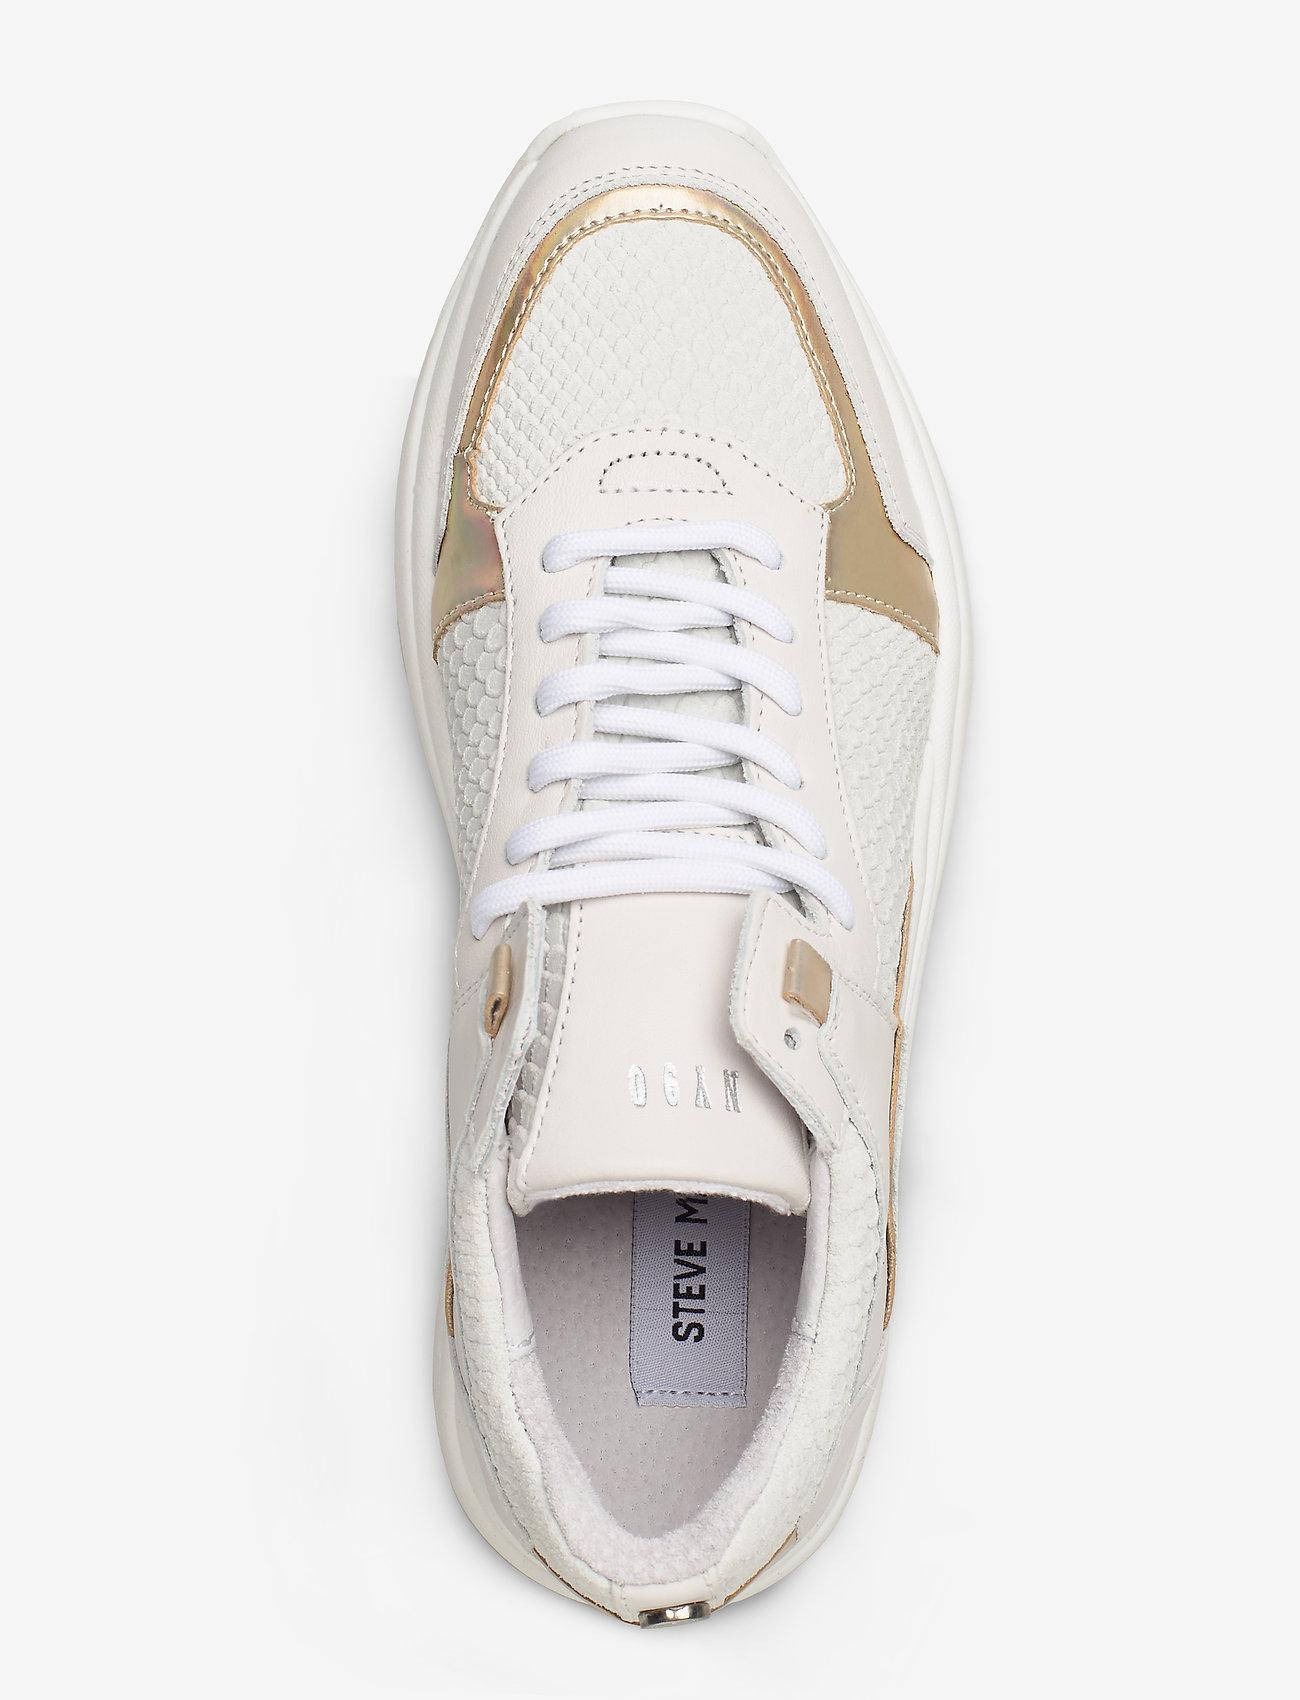 Flexy Sneaker (White Suede) - Steve Madden